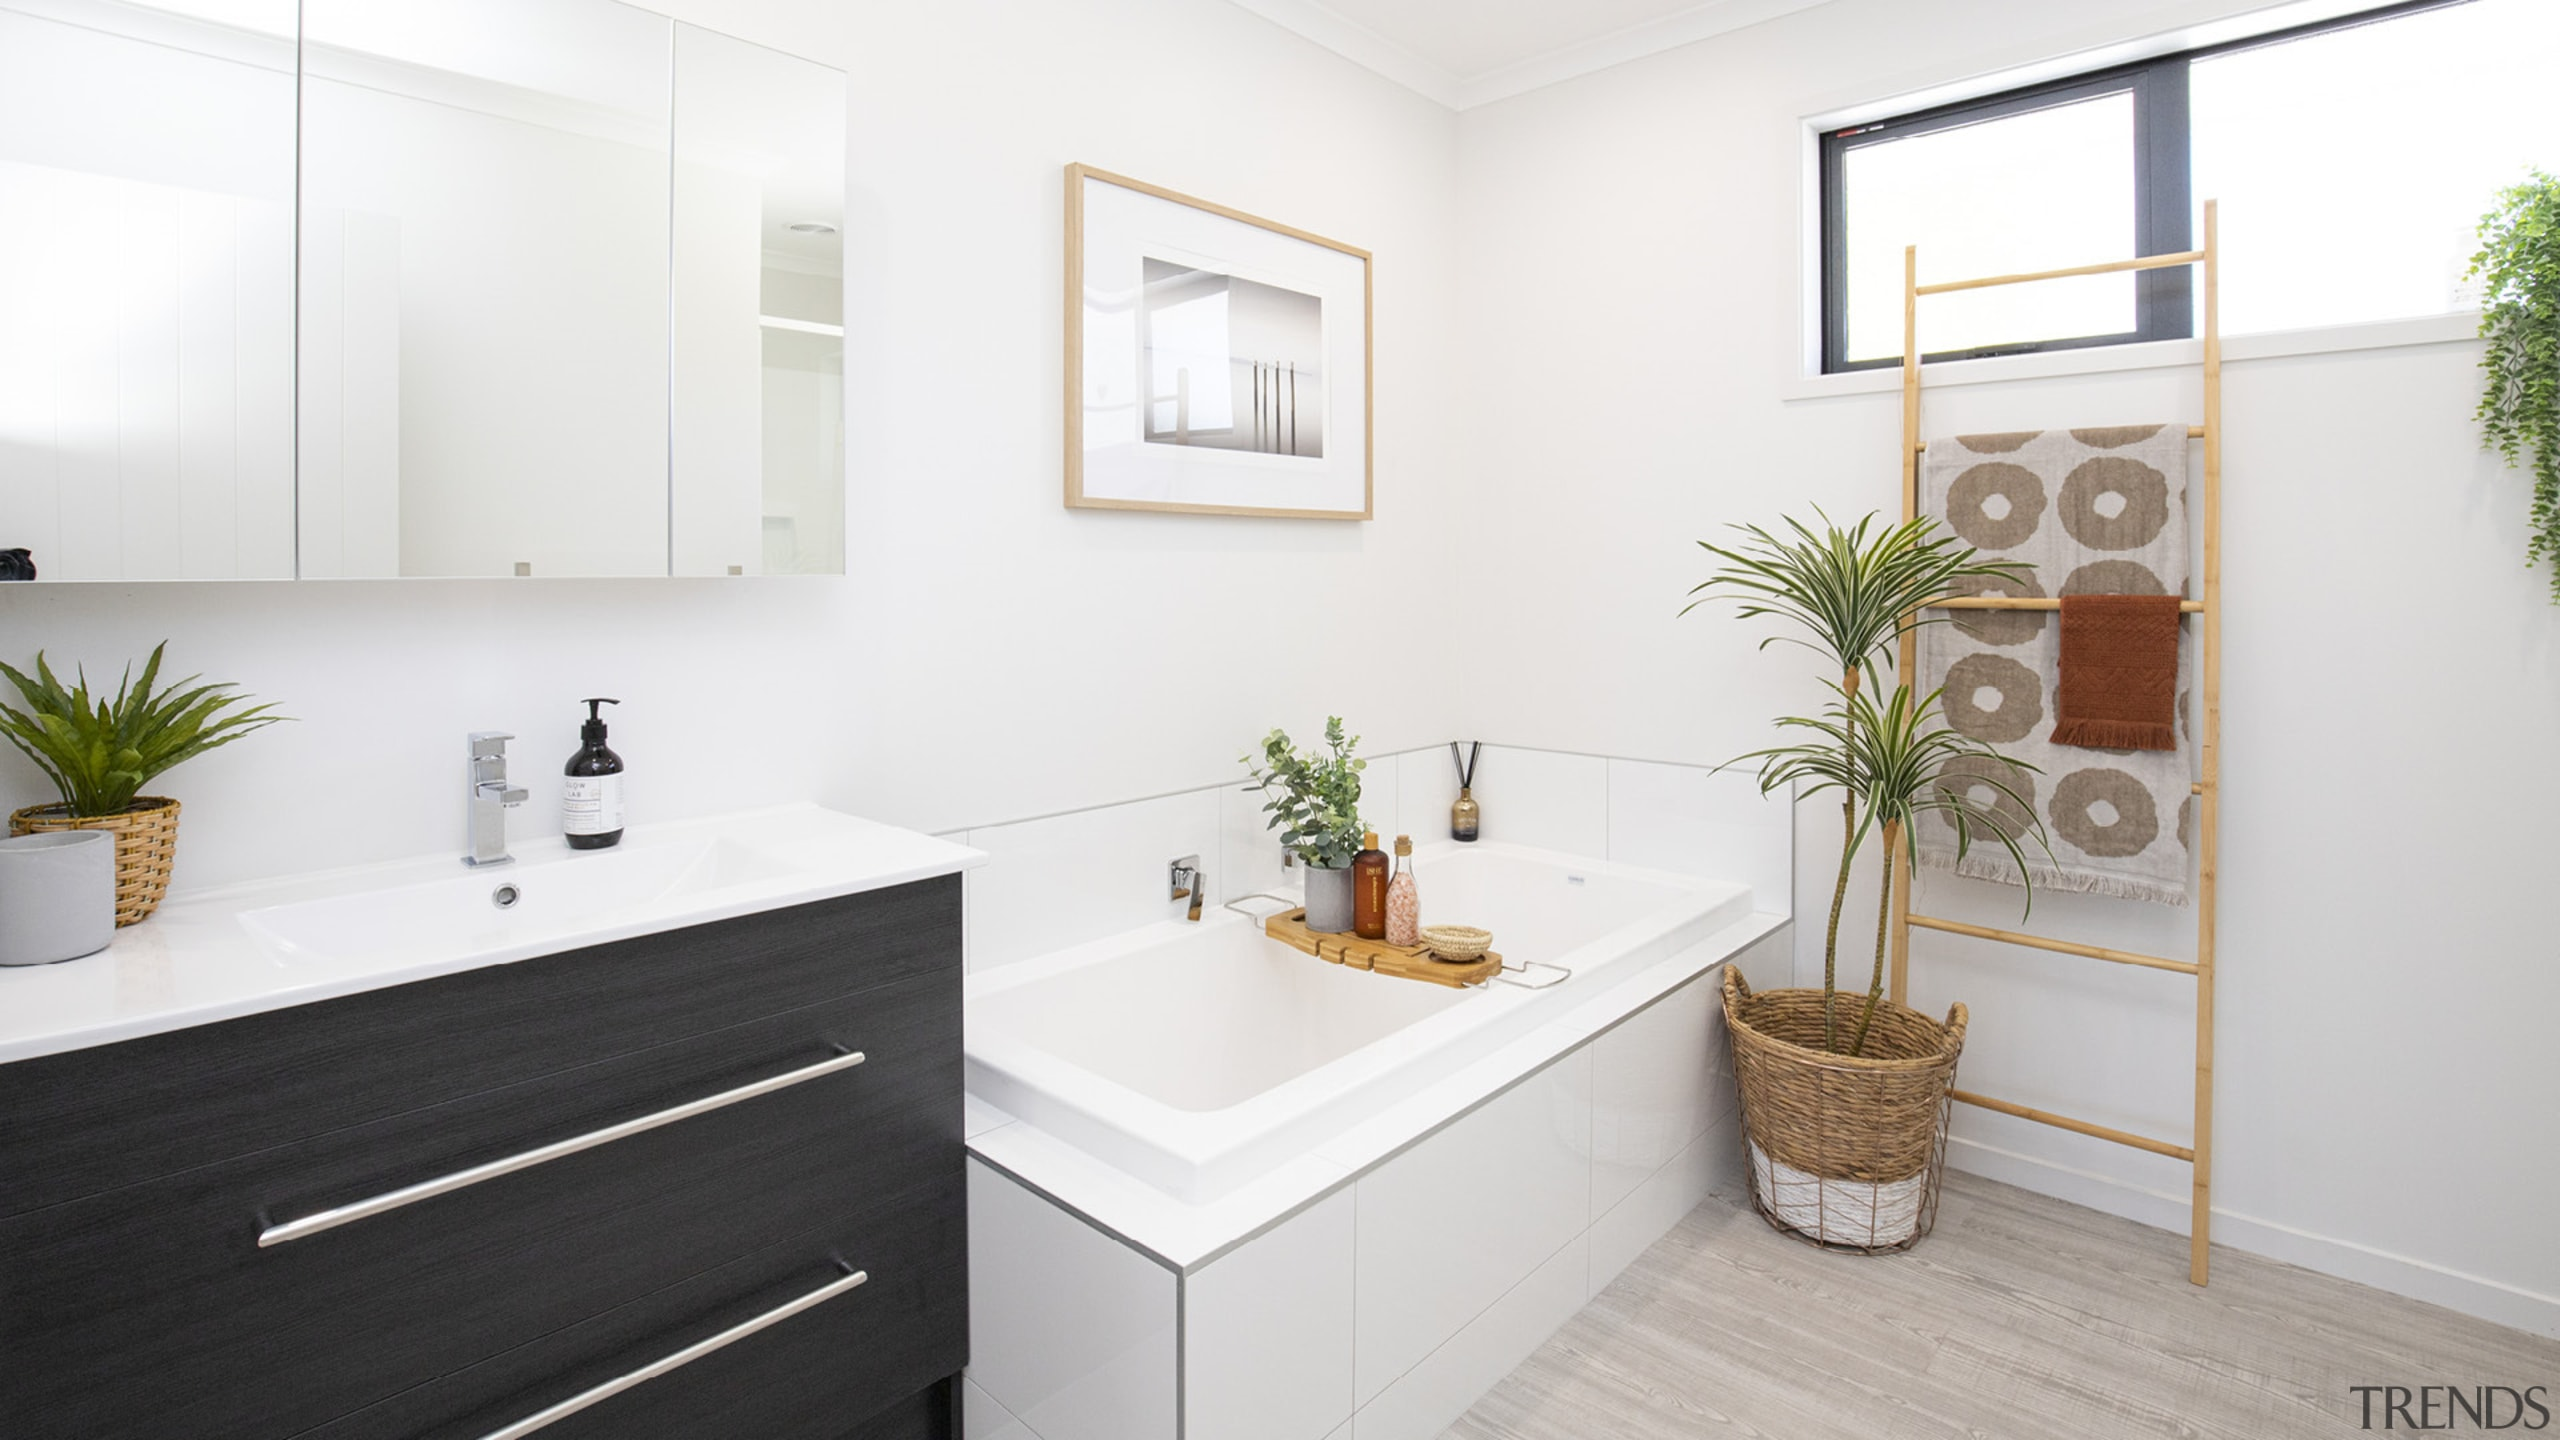 The quality bathroom vanity is Raymor – in